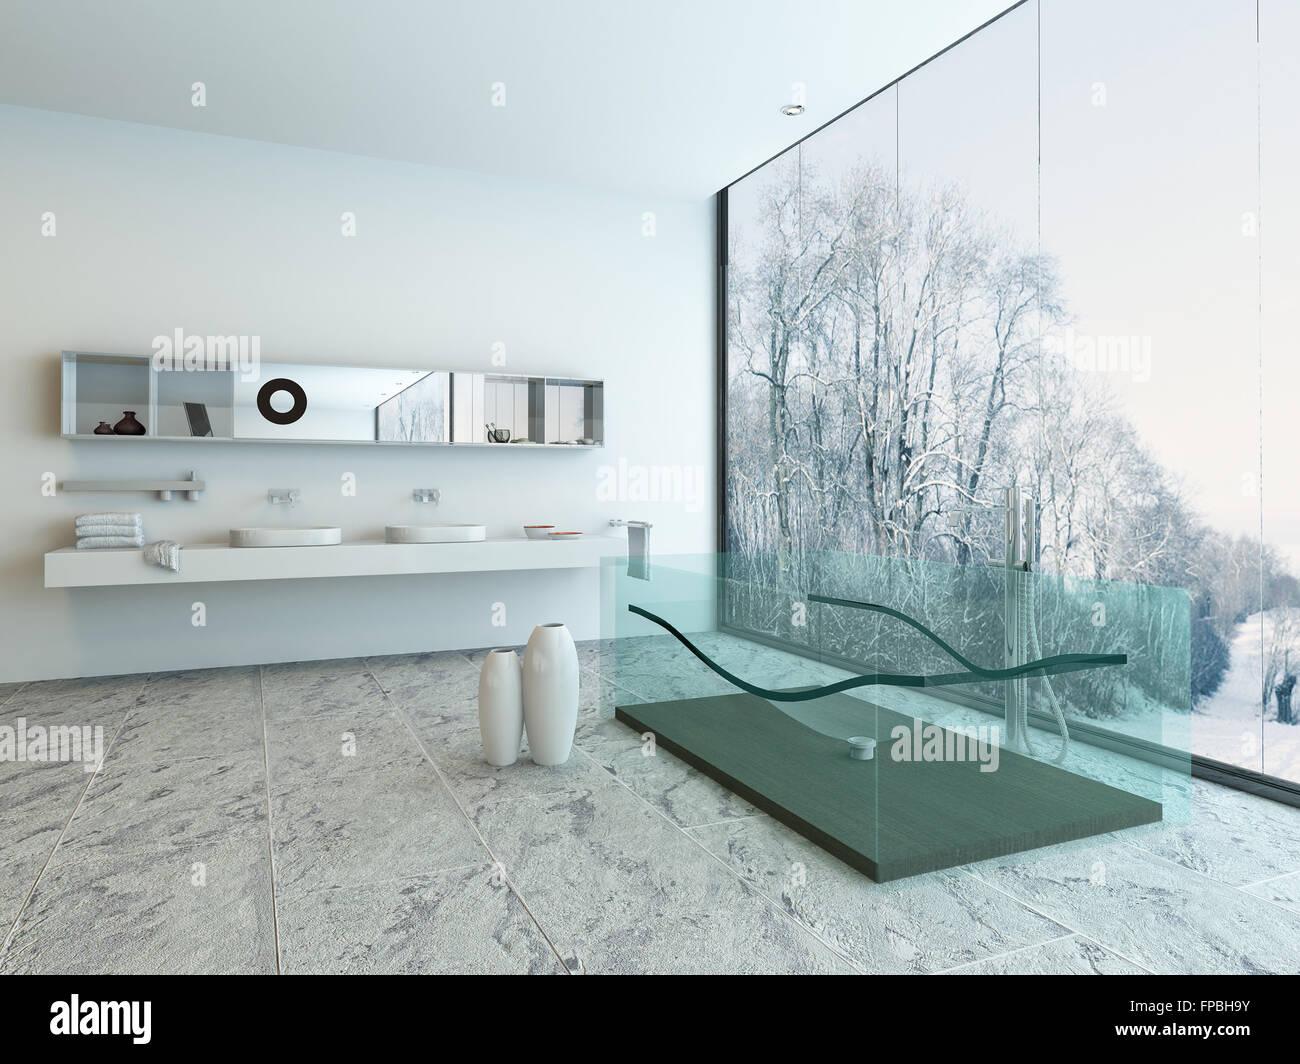 glass glas transparent bathtub tub bathroom Stock Photo: 99829351 ...